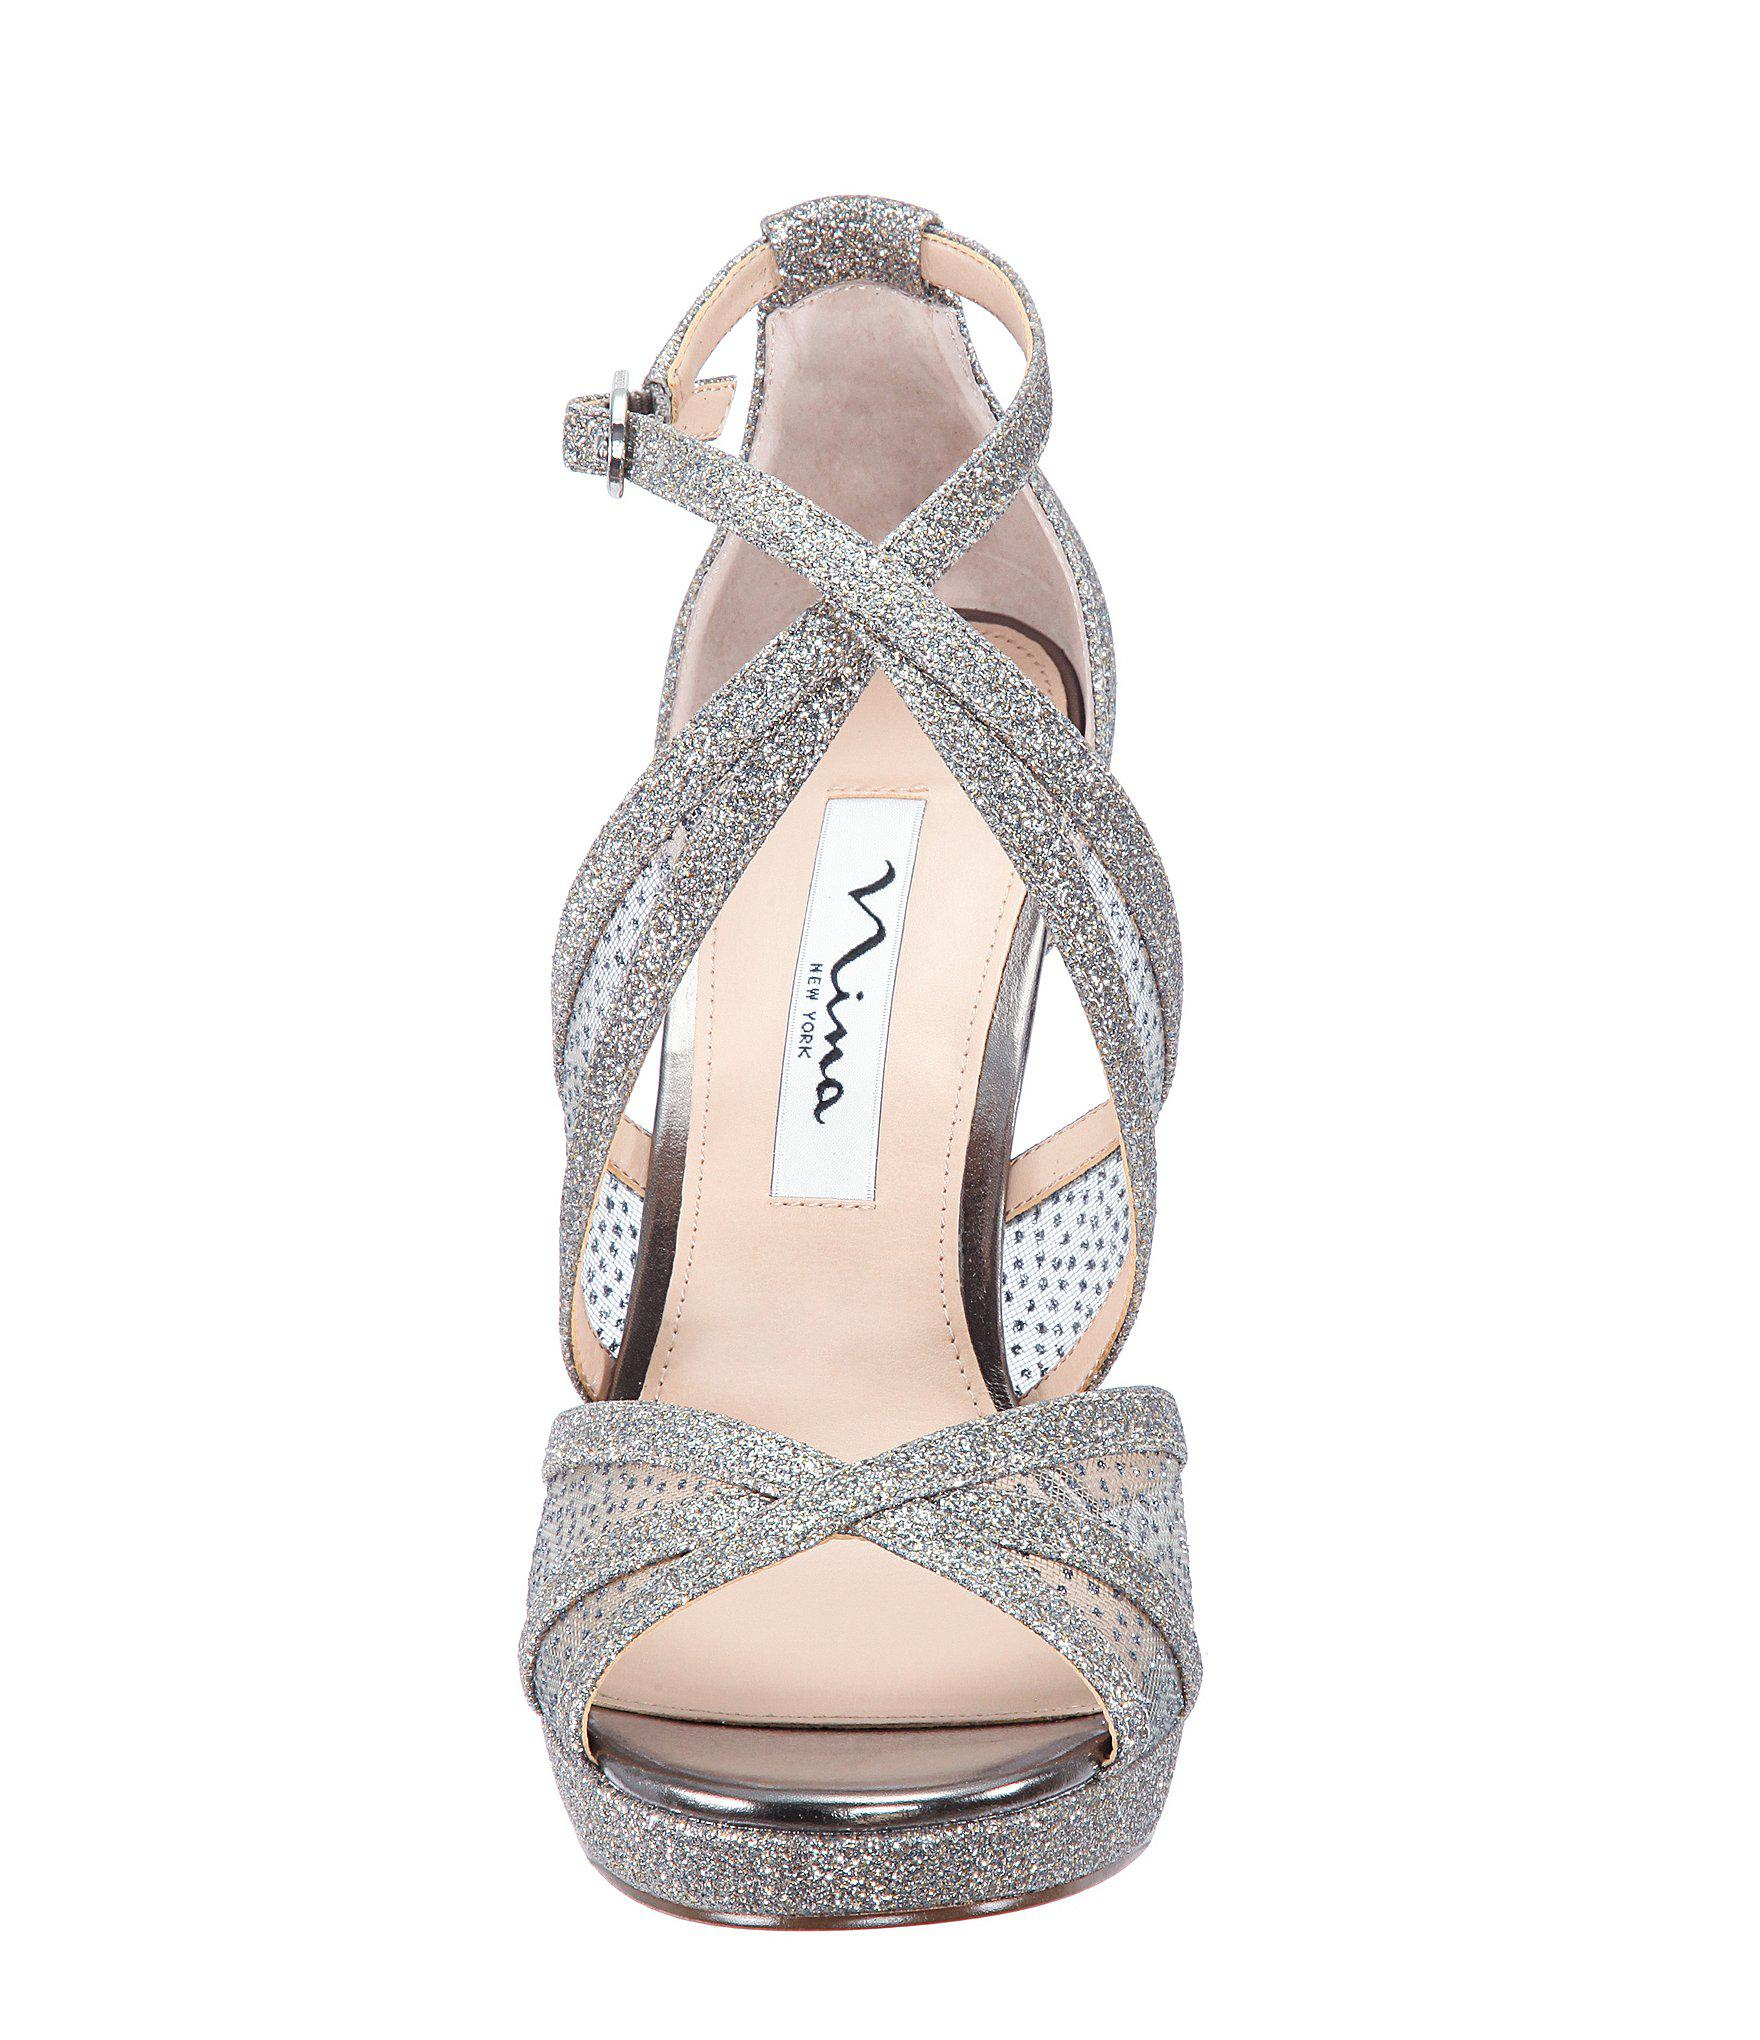 564763881106 Lyst - Nina Fenna Glitter Strappy Dress Sandals